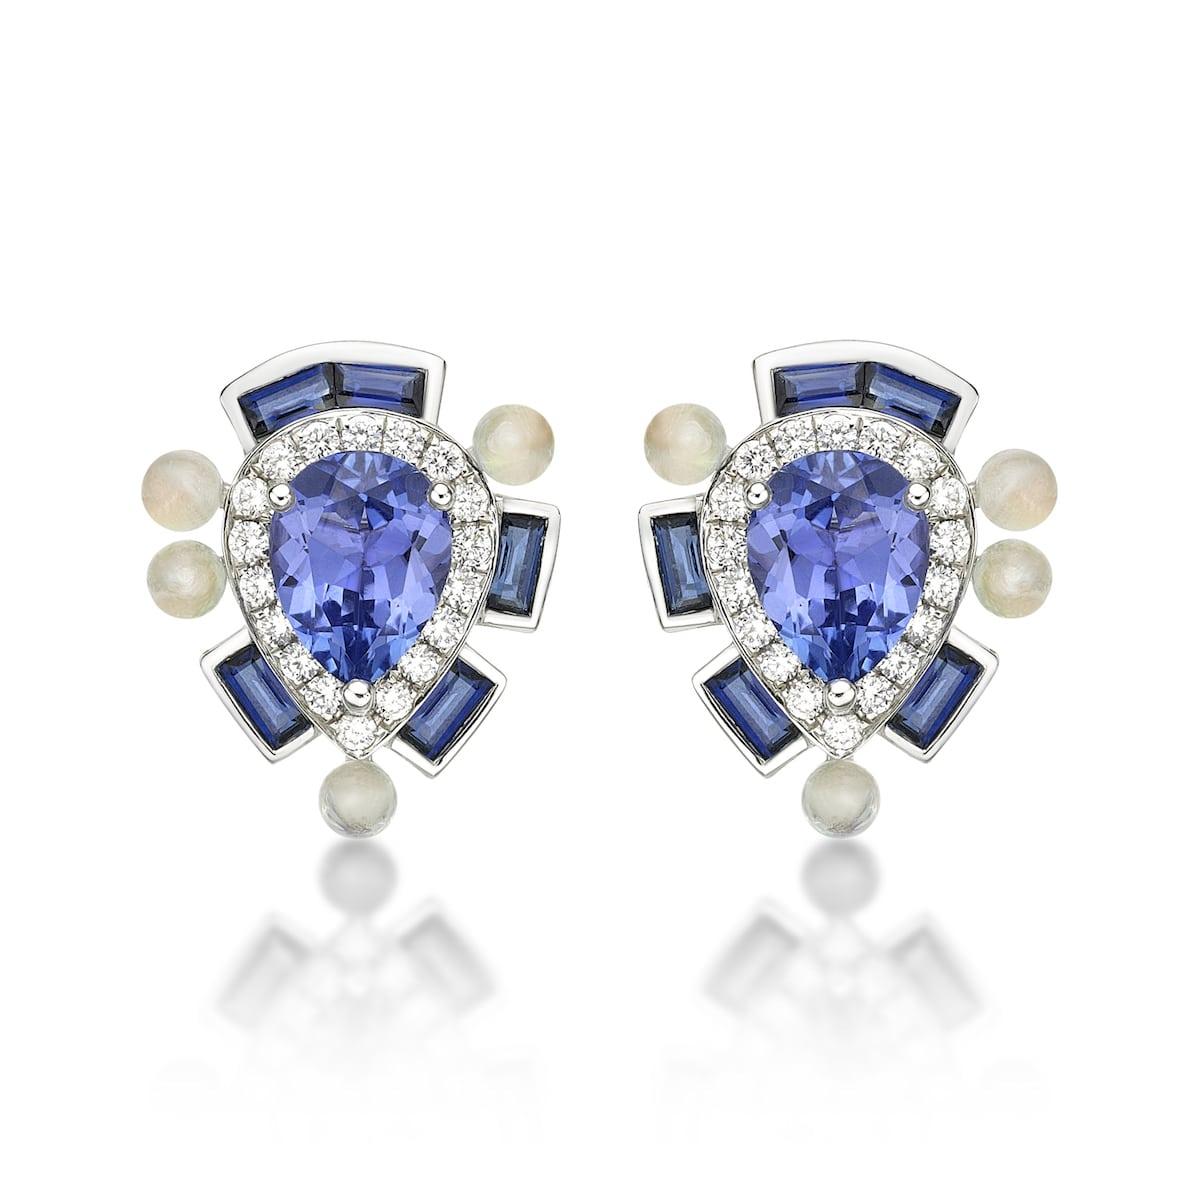 Wisteria-Blue-Studs-18ct-white-gold-white-diamonds-Rainbow-moonstone-Blue-sapphire-and-Tanzanite-Sarah-Ho